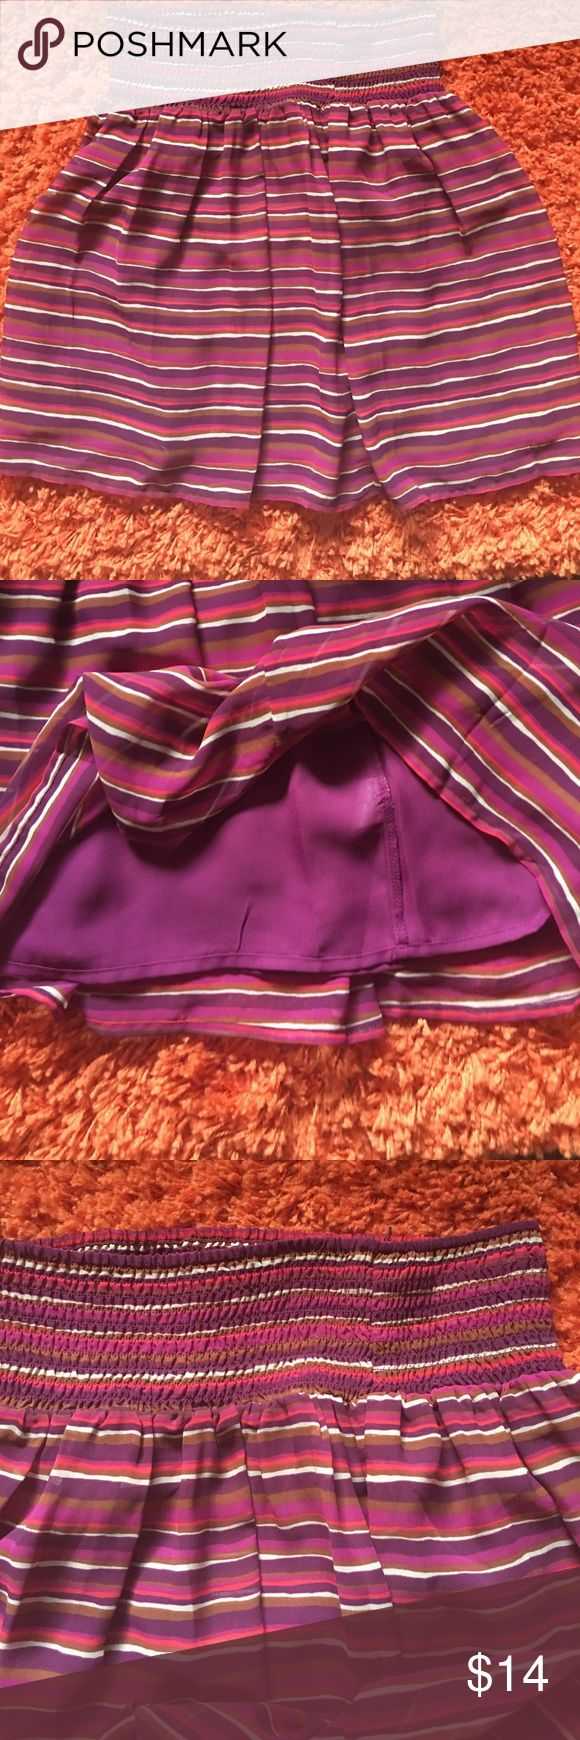 Old Navy lined skirt.  Like new. Medium Old Navy lined skirt. Medium like new. Old Navy  Skirts